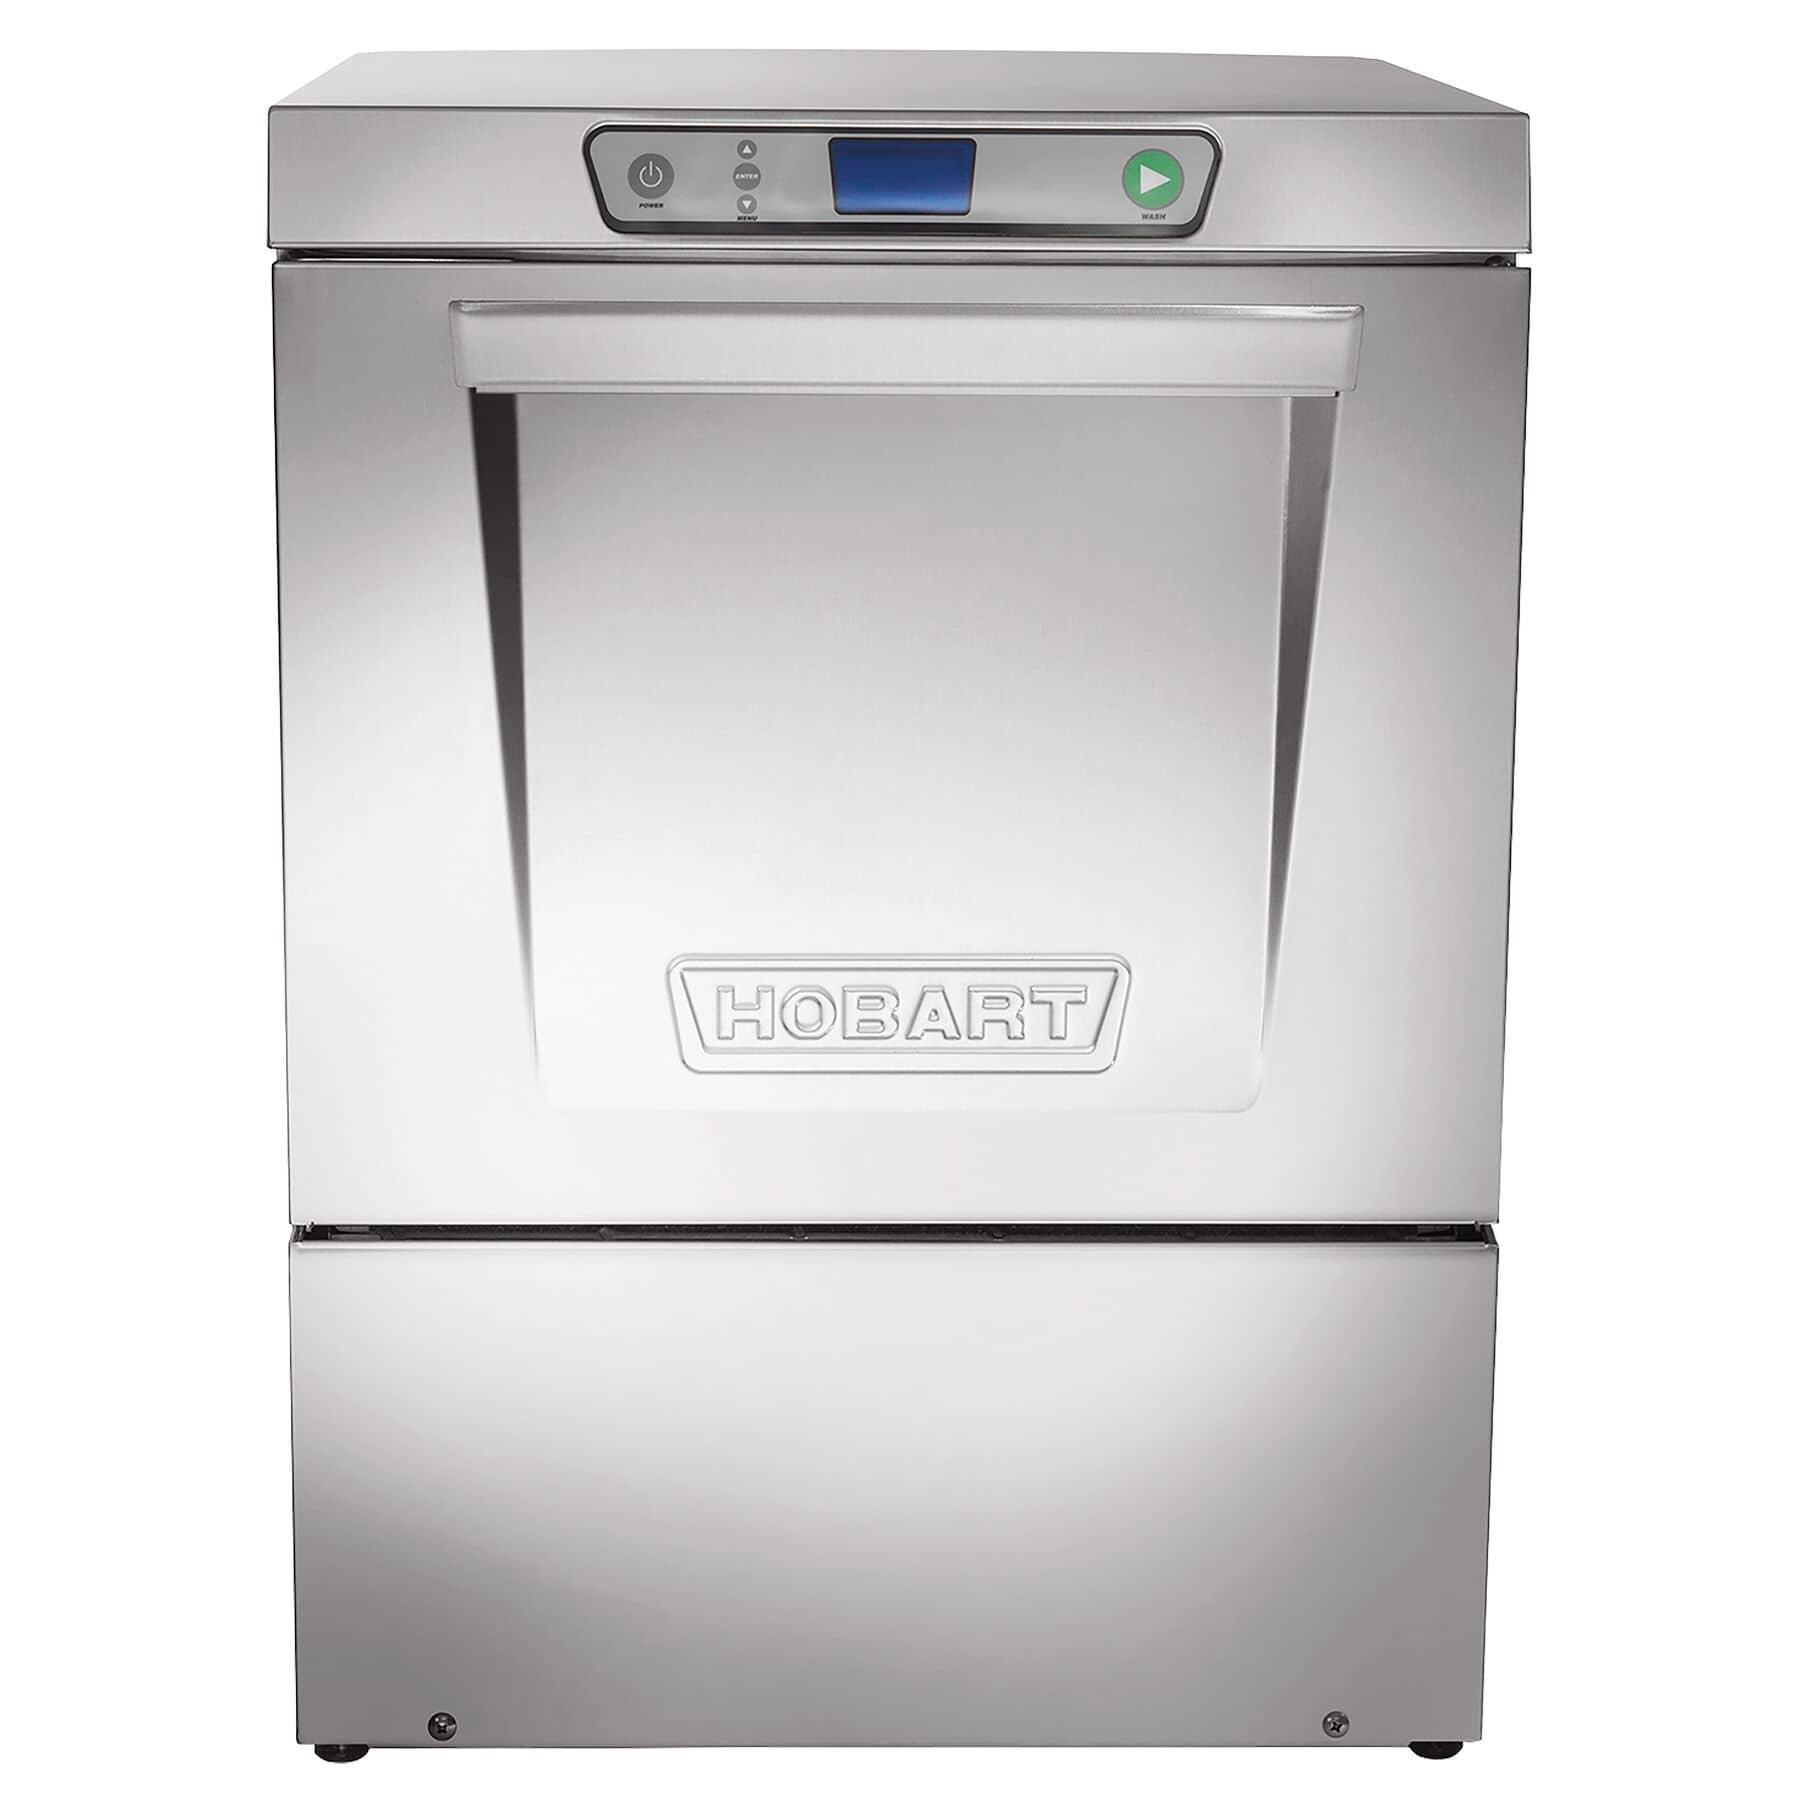 Hobart LXEC-3 LXe Dishwasher at www ckitchen com